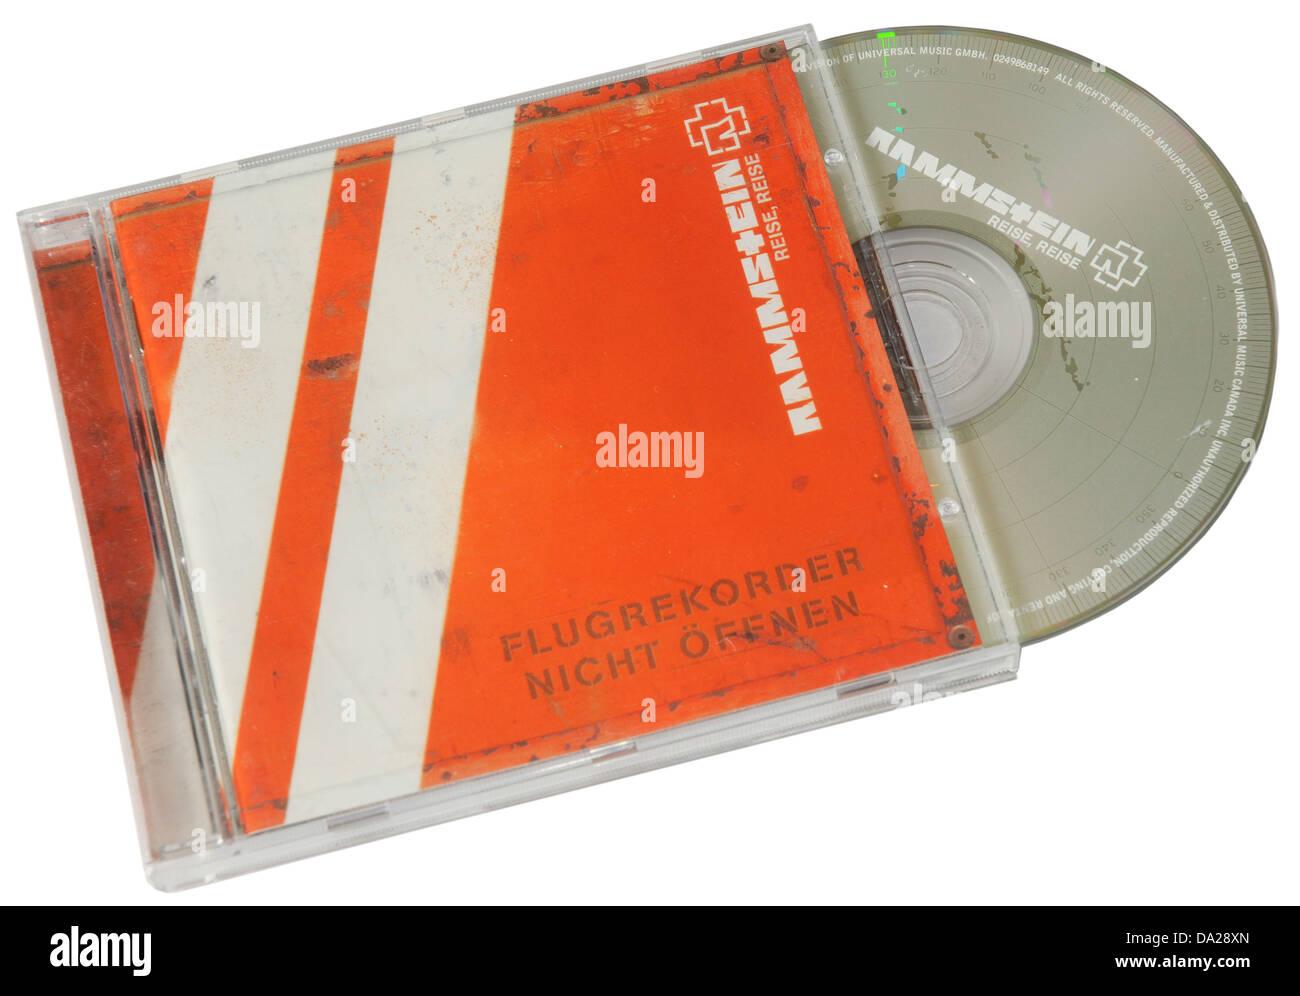 Rammstein Reise Reise Album auf CD Stockbild